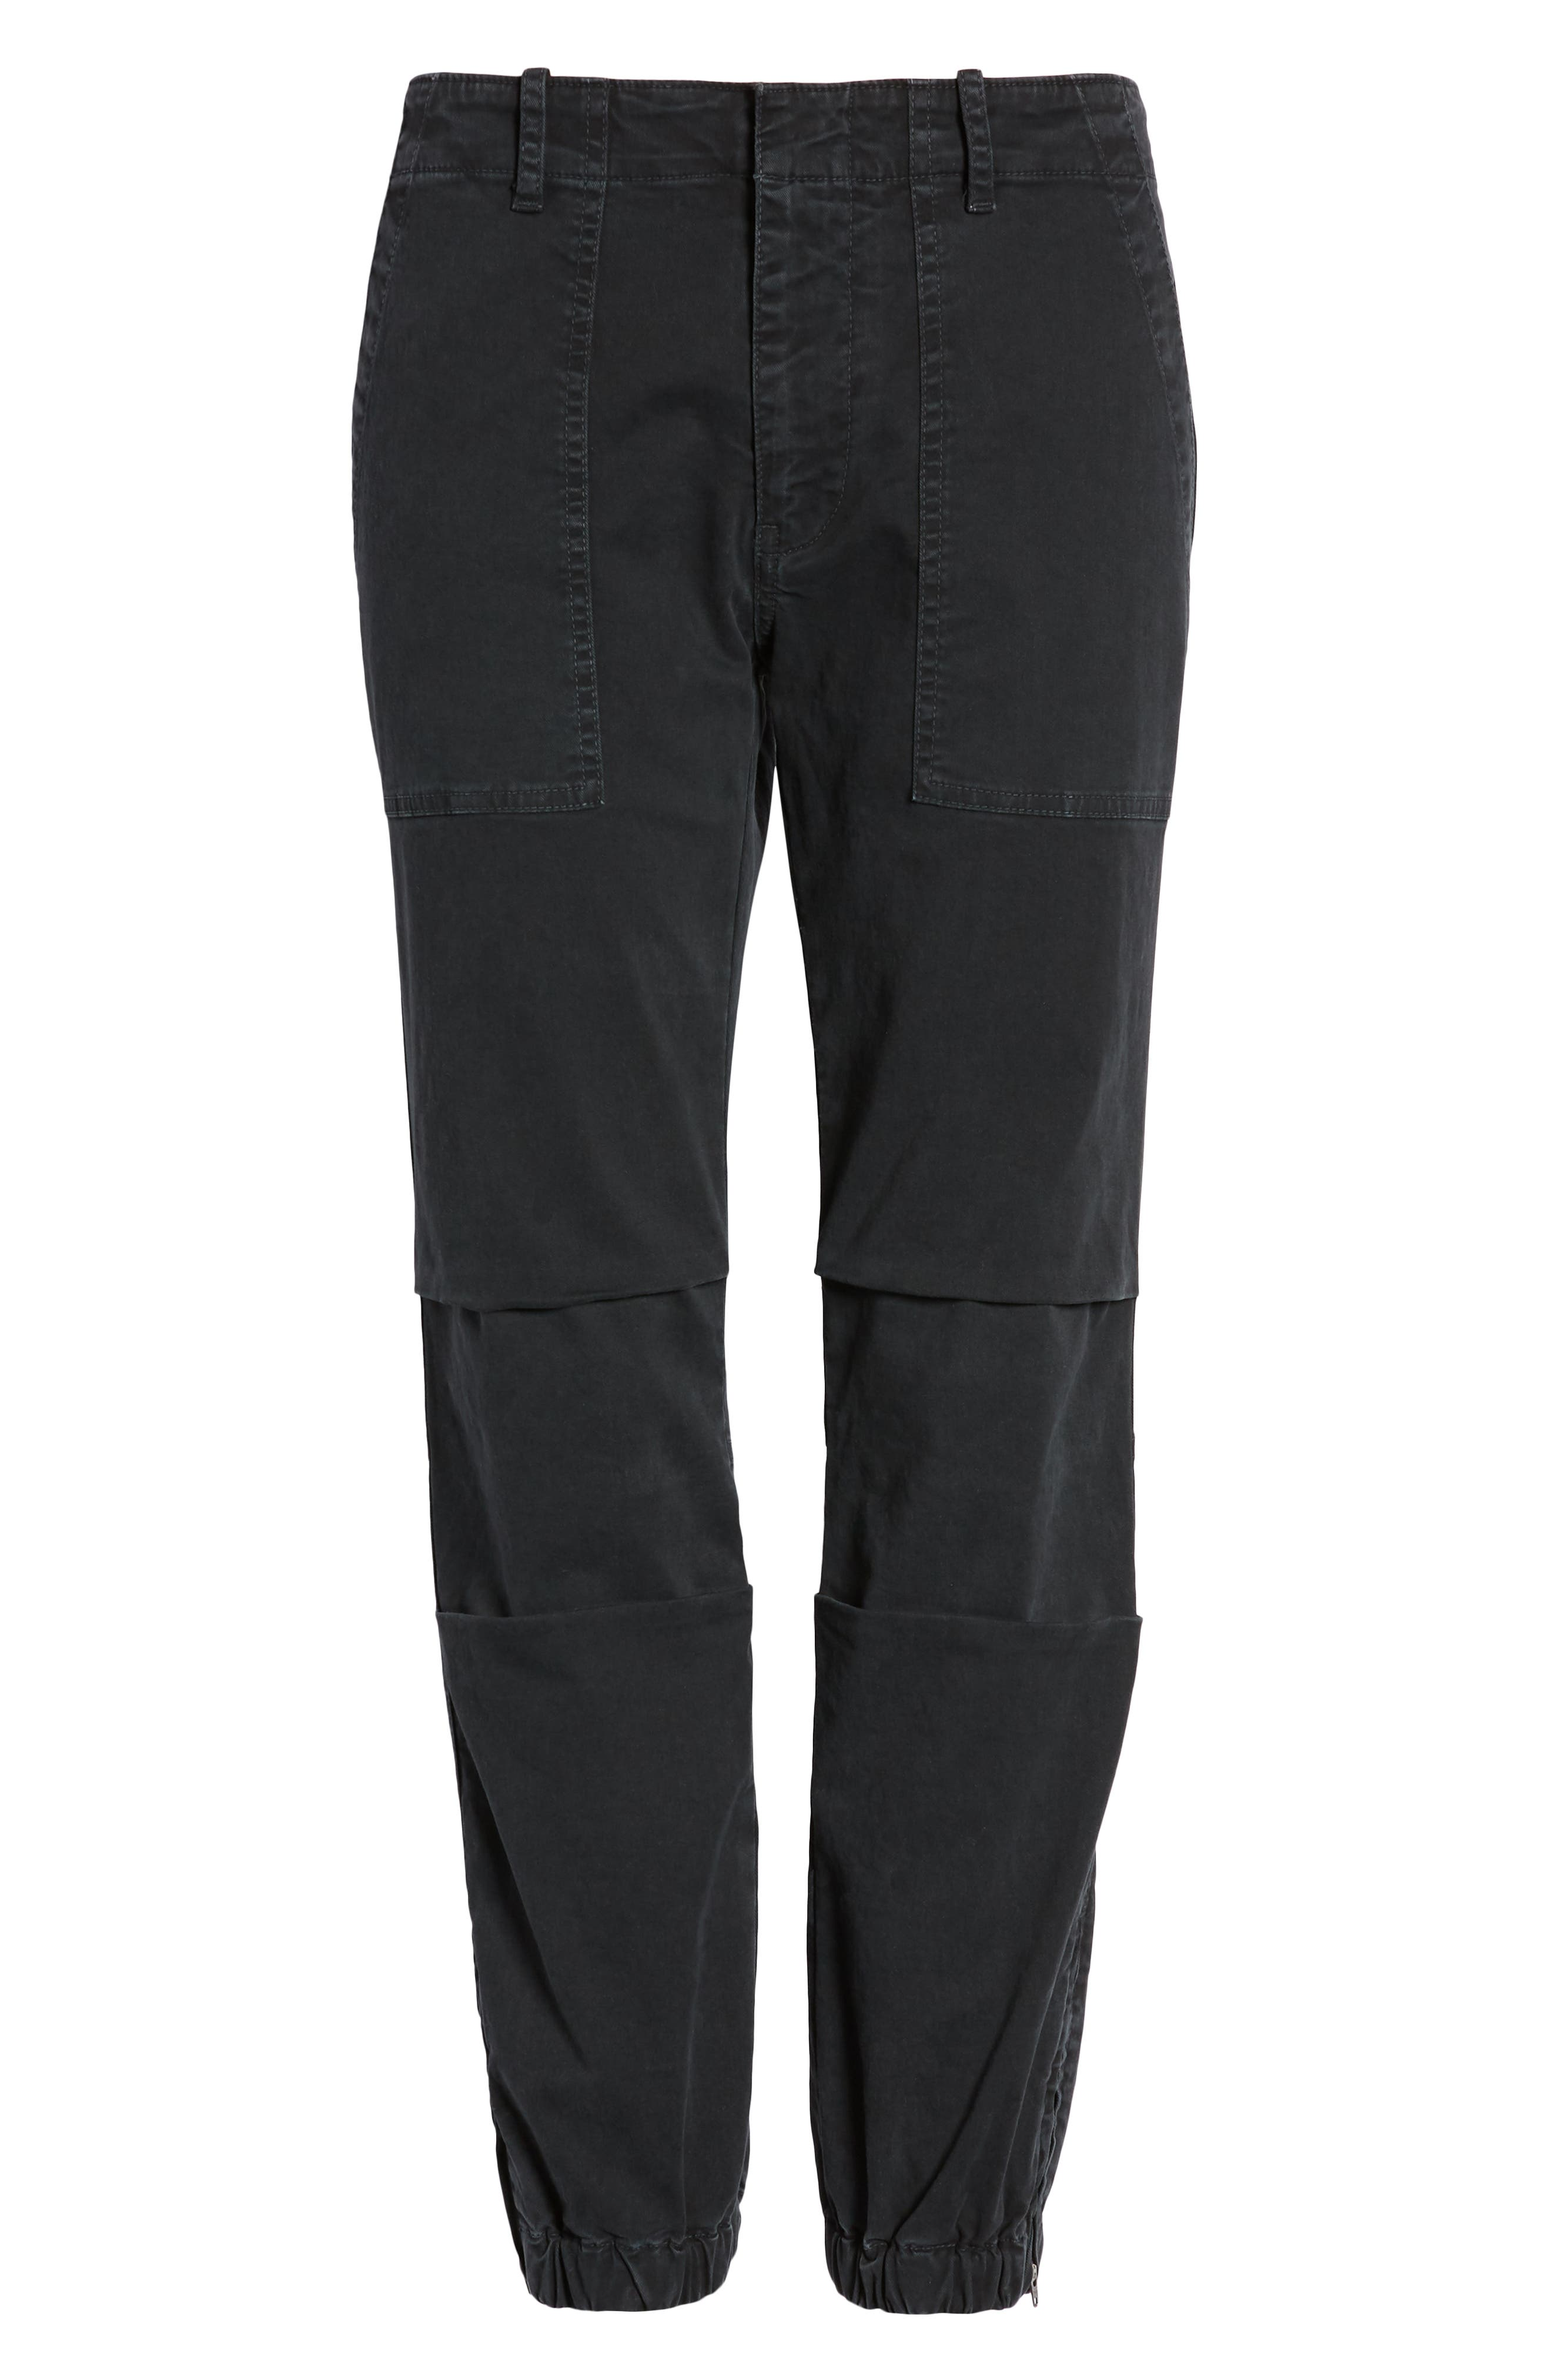 NILI LOTAN, Stretch Cotton Twill Crop Military Pants, Alternate thumbnail 7, color, CARBON